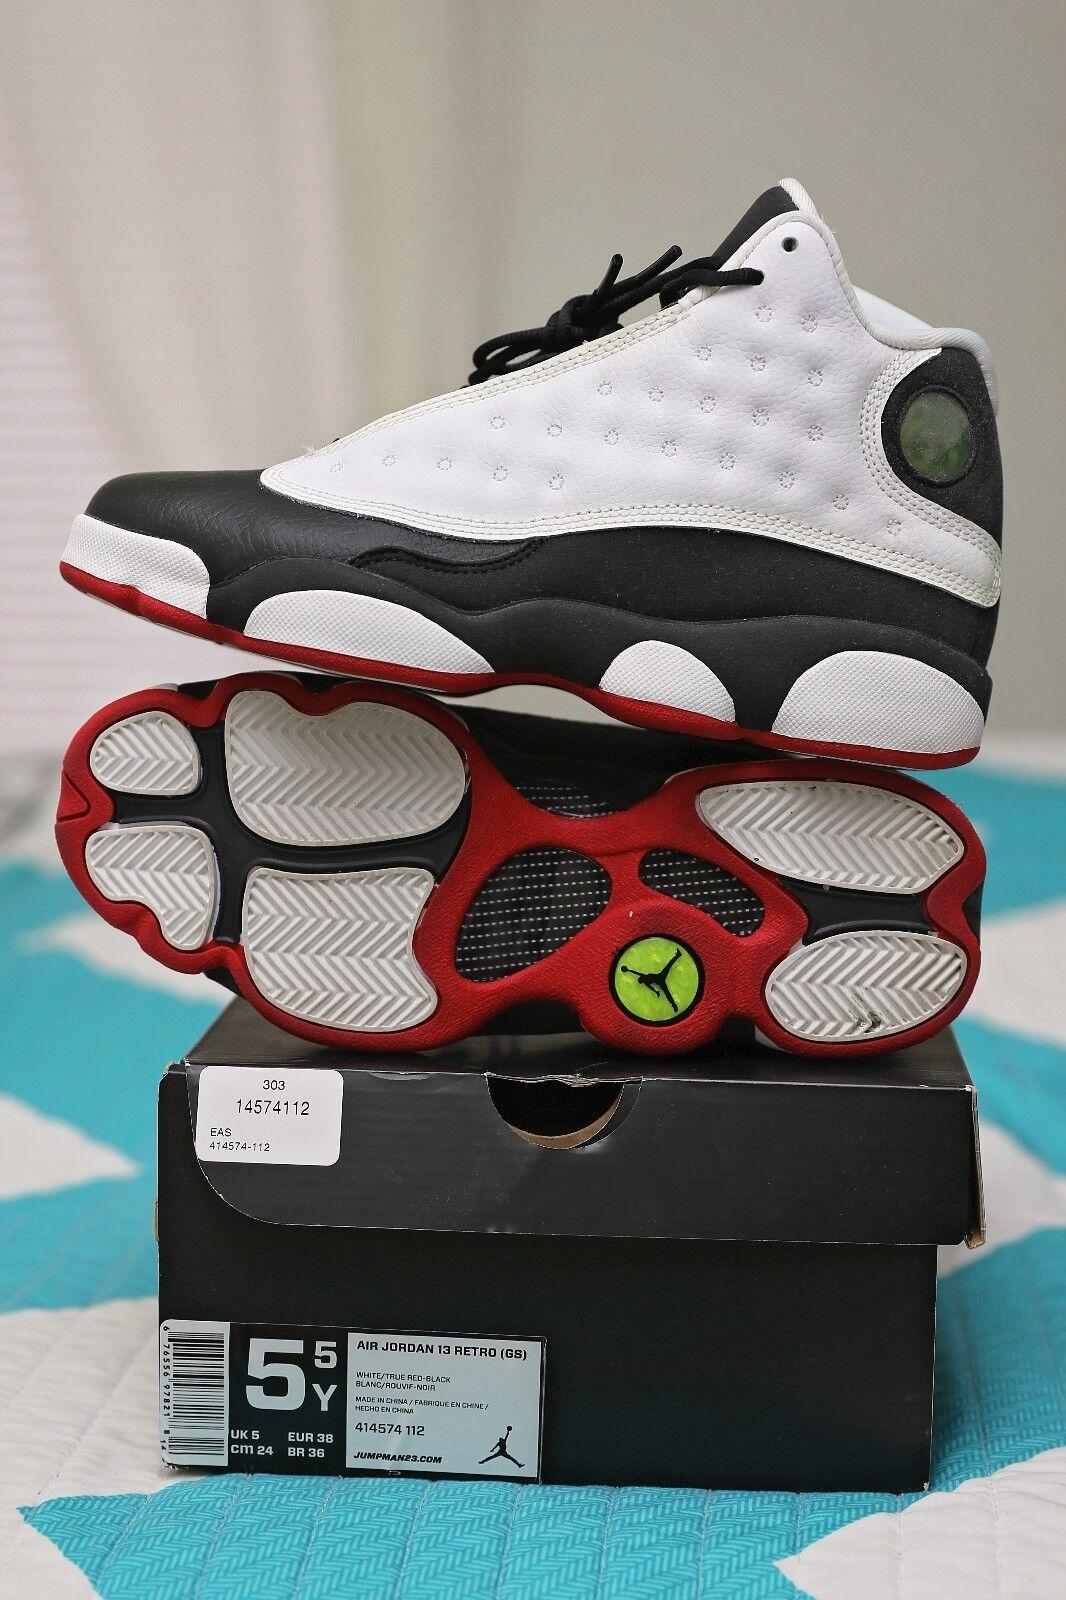 Nike Air Jordan 13 Retro He Got Game GS Sz. 5.5